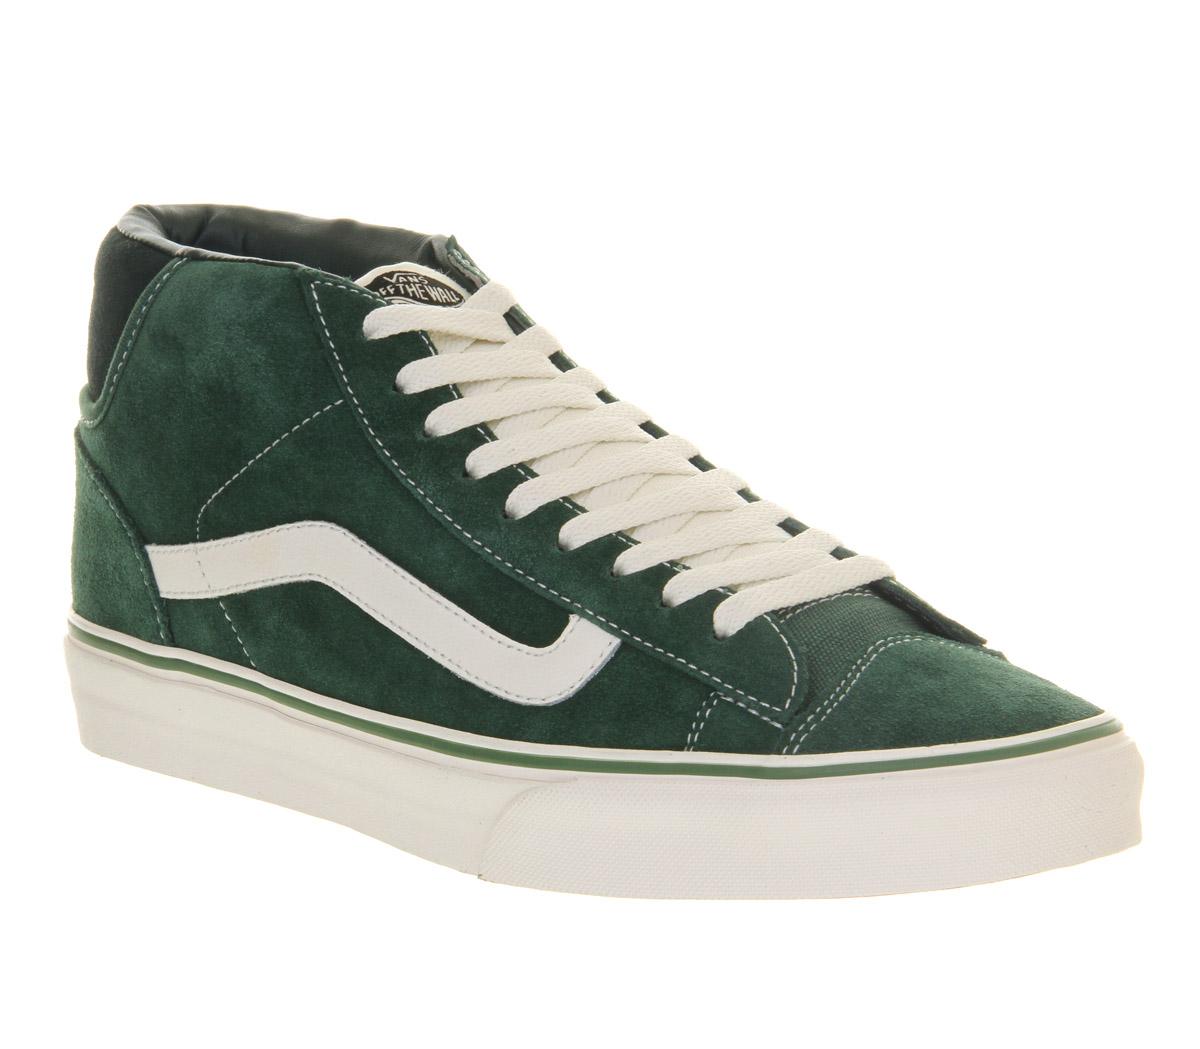 61d27460ca Vans Mid Skool 77 in Green for Men - Lyst